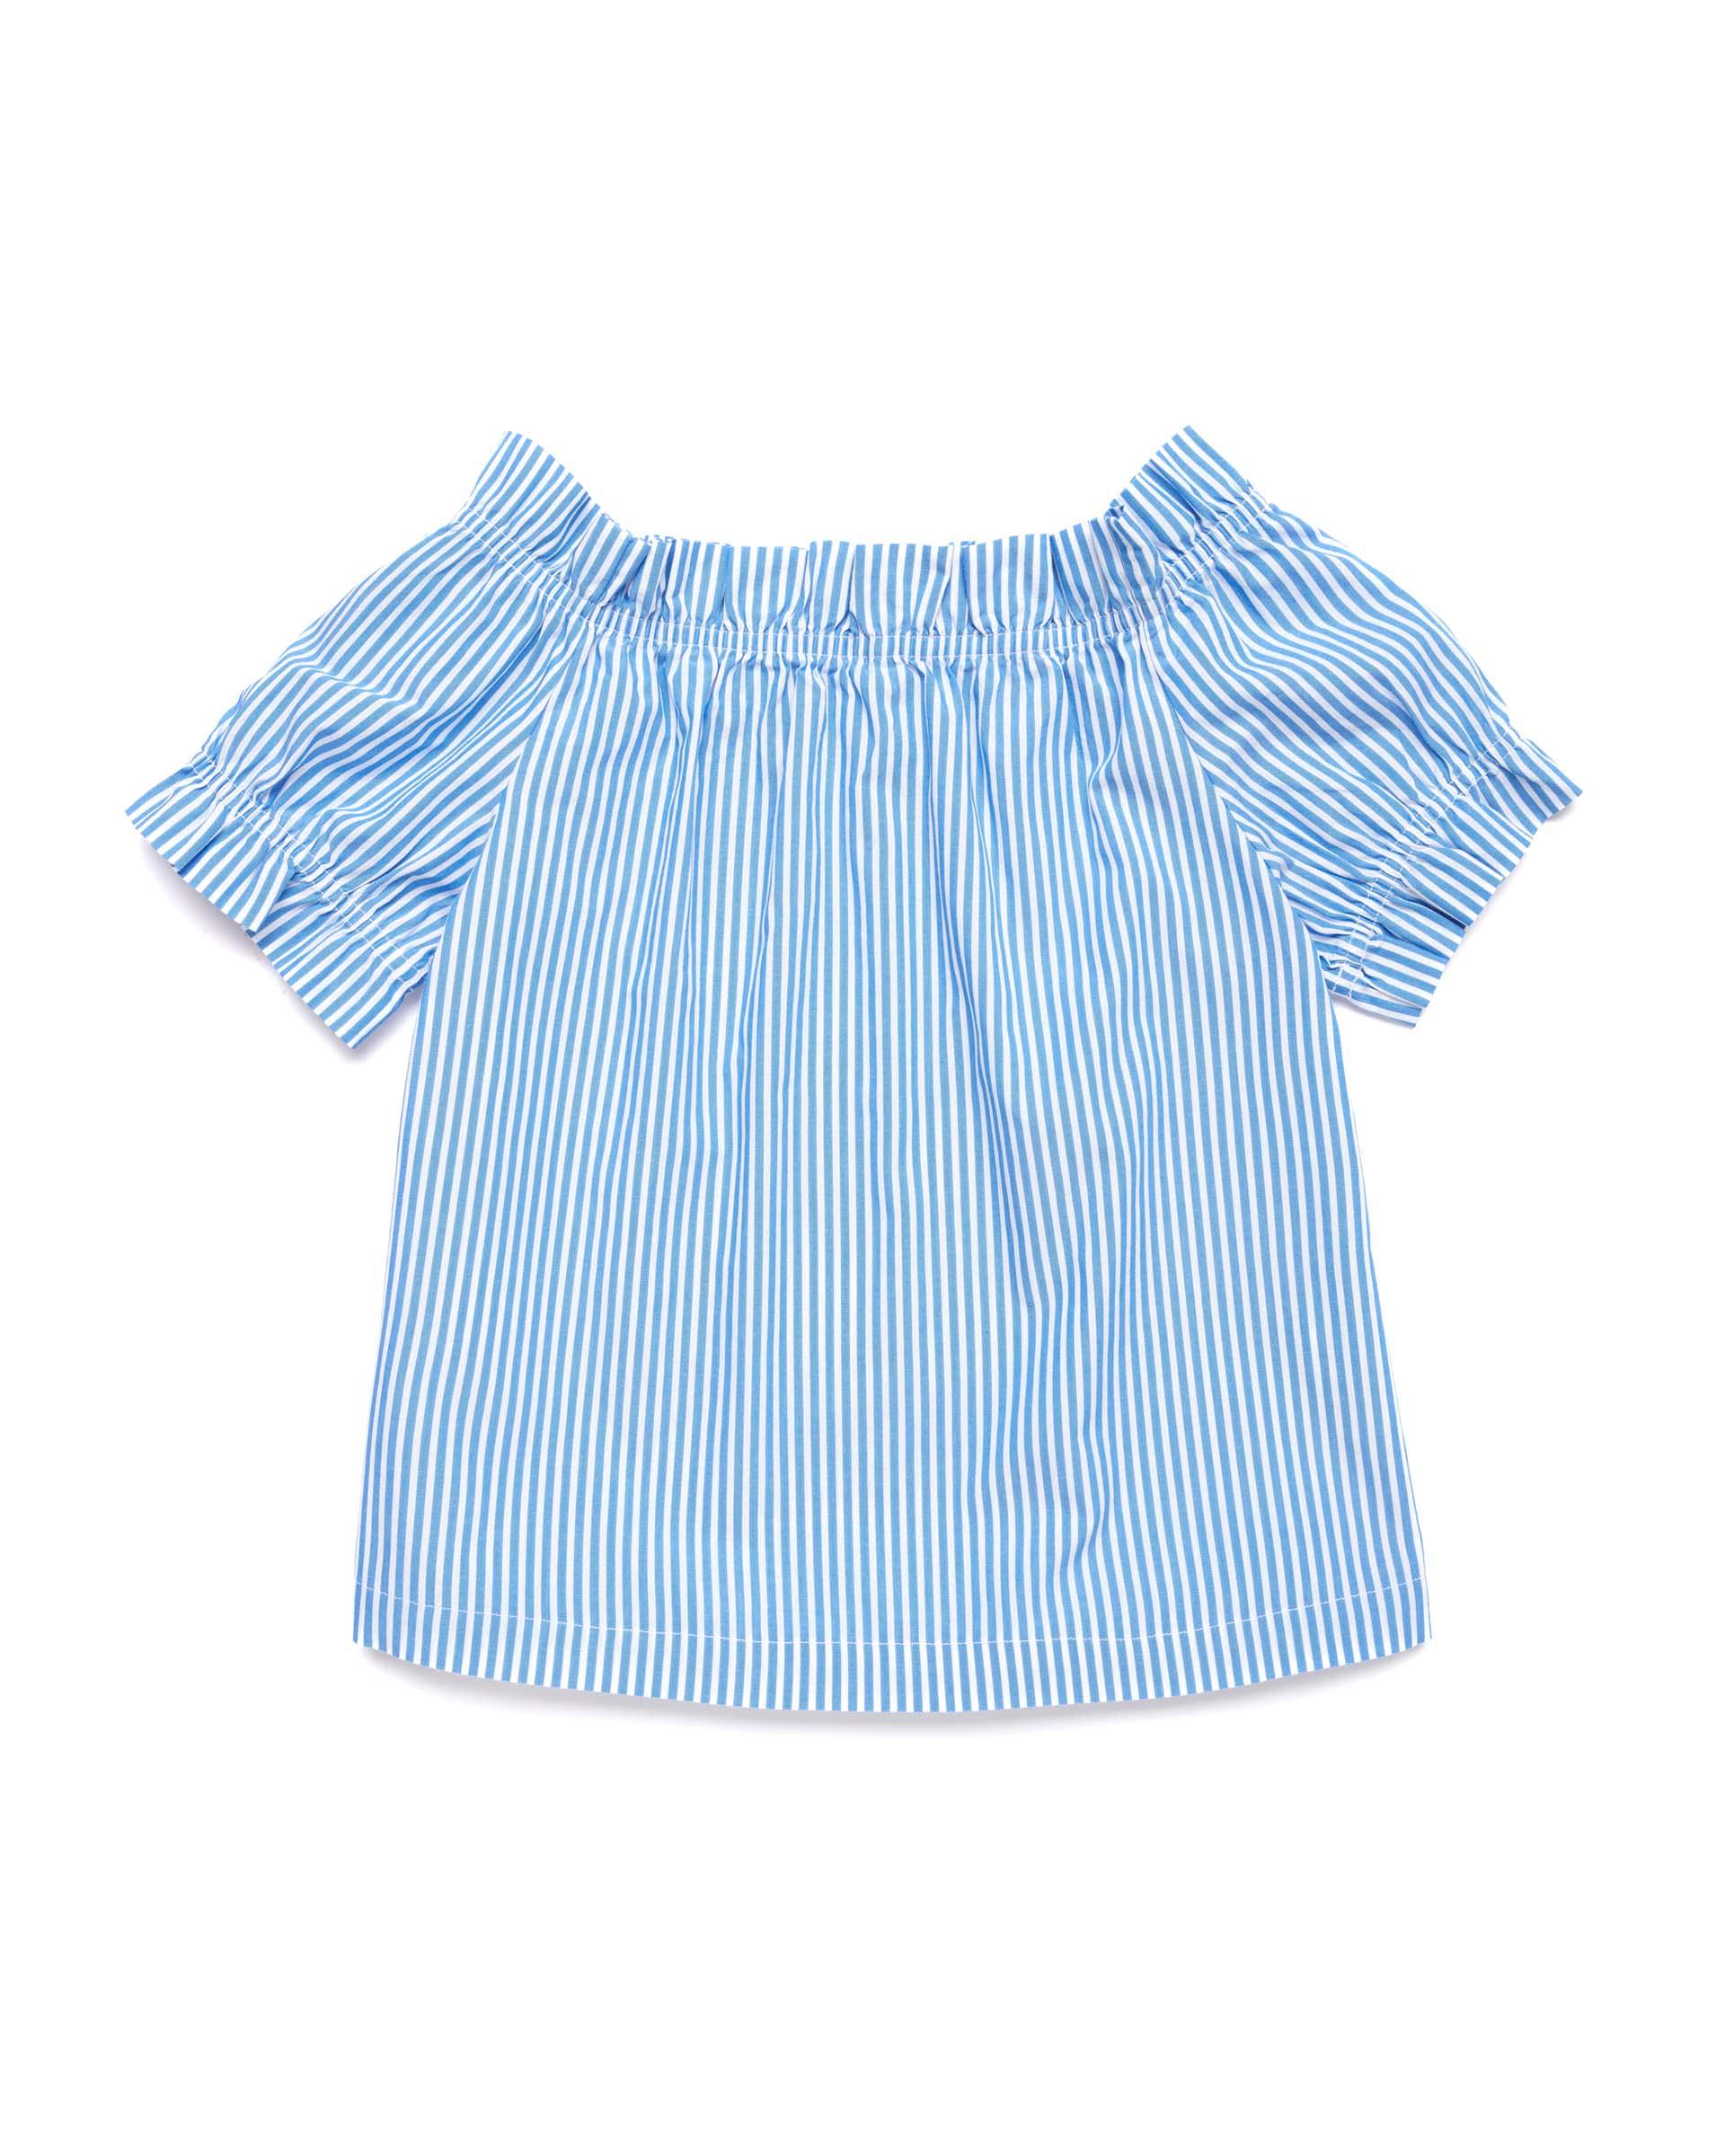 Купить 20P_5OT65QH40_901, Блуза для девочек Benetton 5OT65QH40_901 р-р 152, United Colors of Benetton, Блузки для девочек